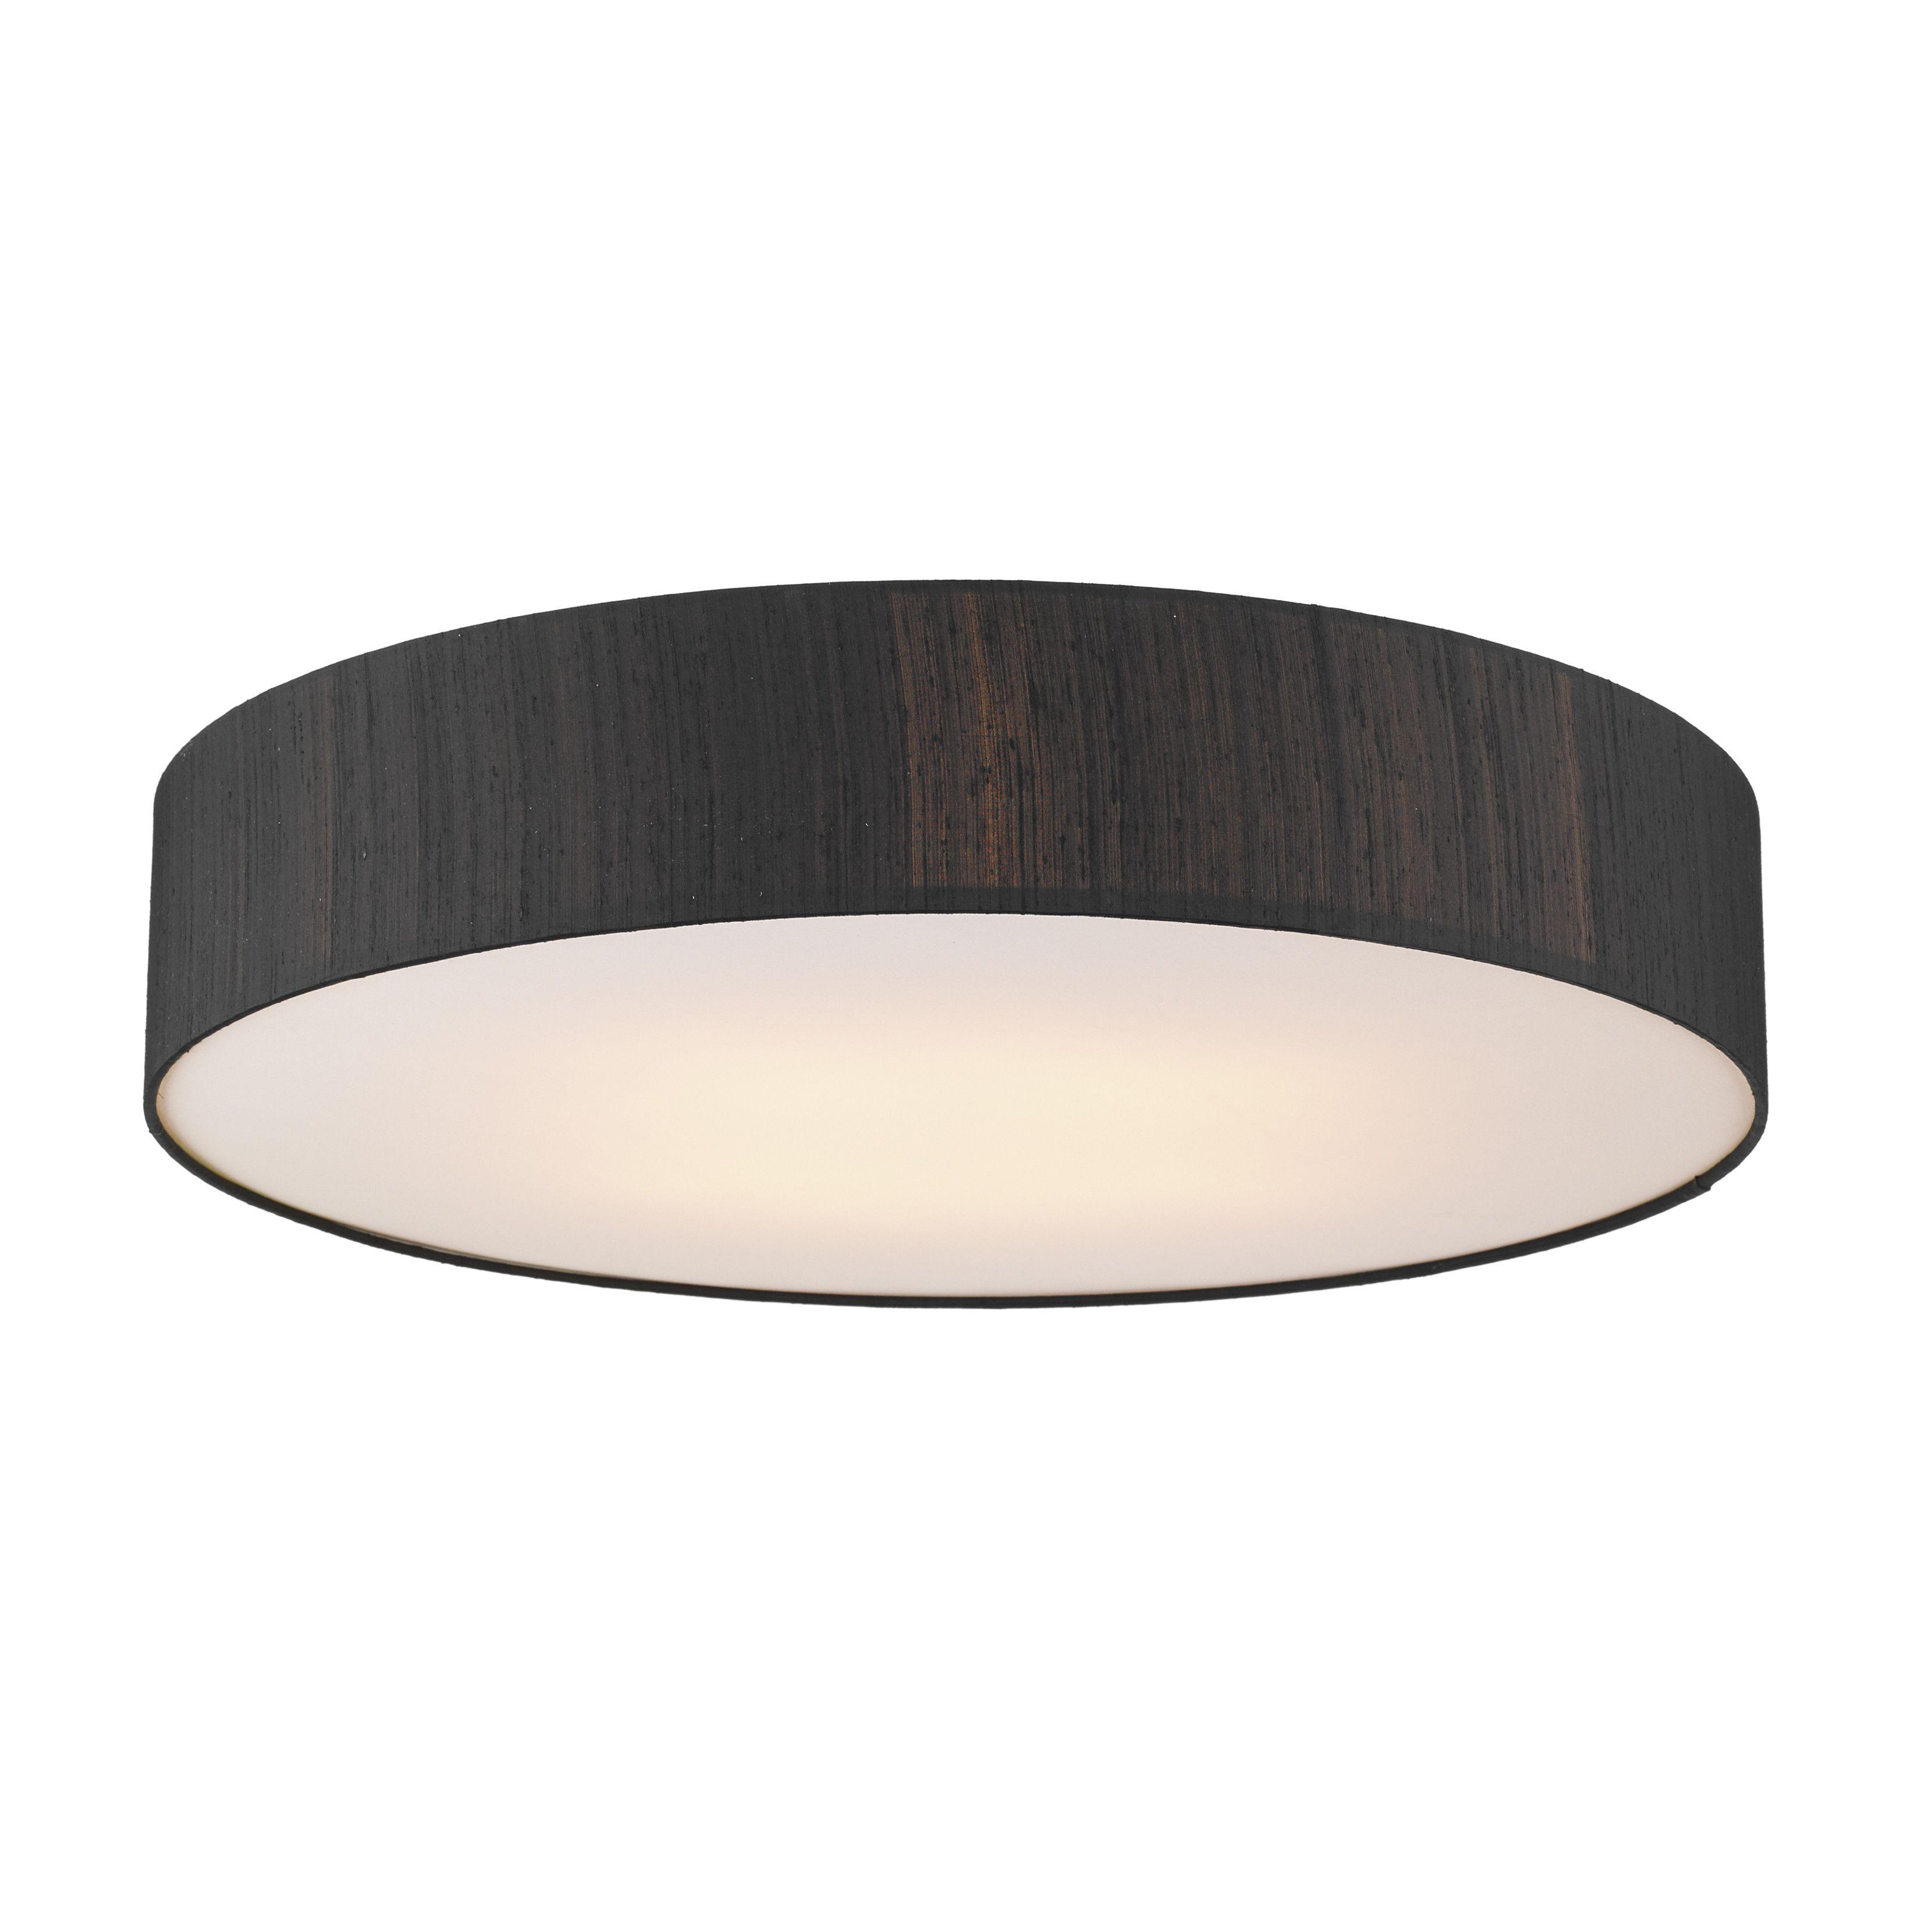 dar lighting paolo 4 light flush light reviews wayfair uk